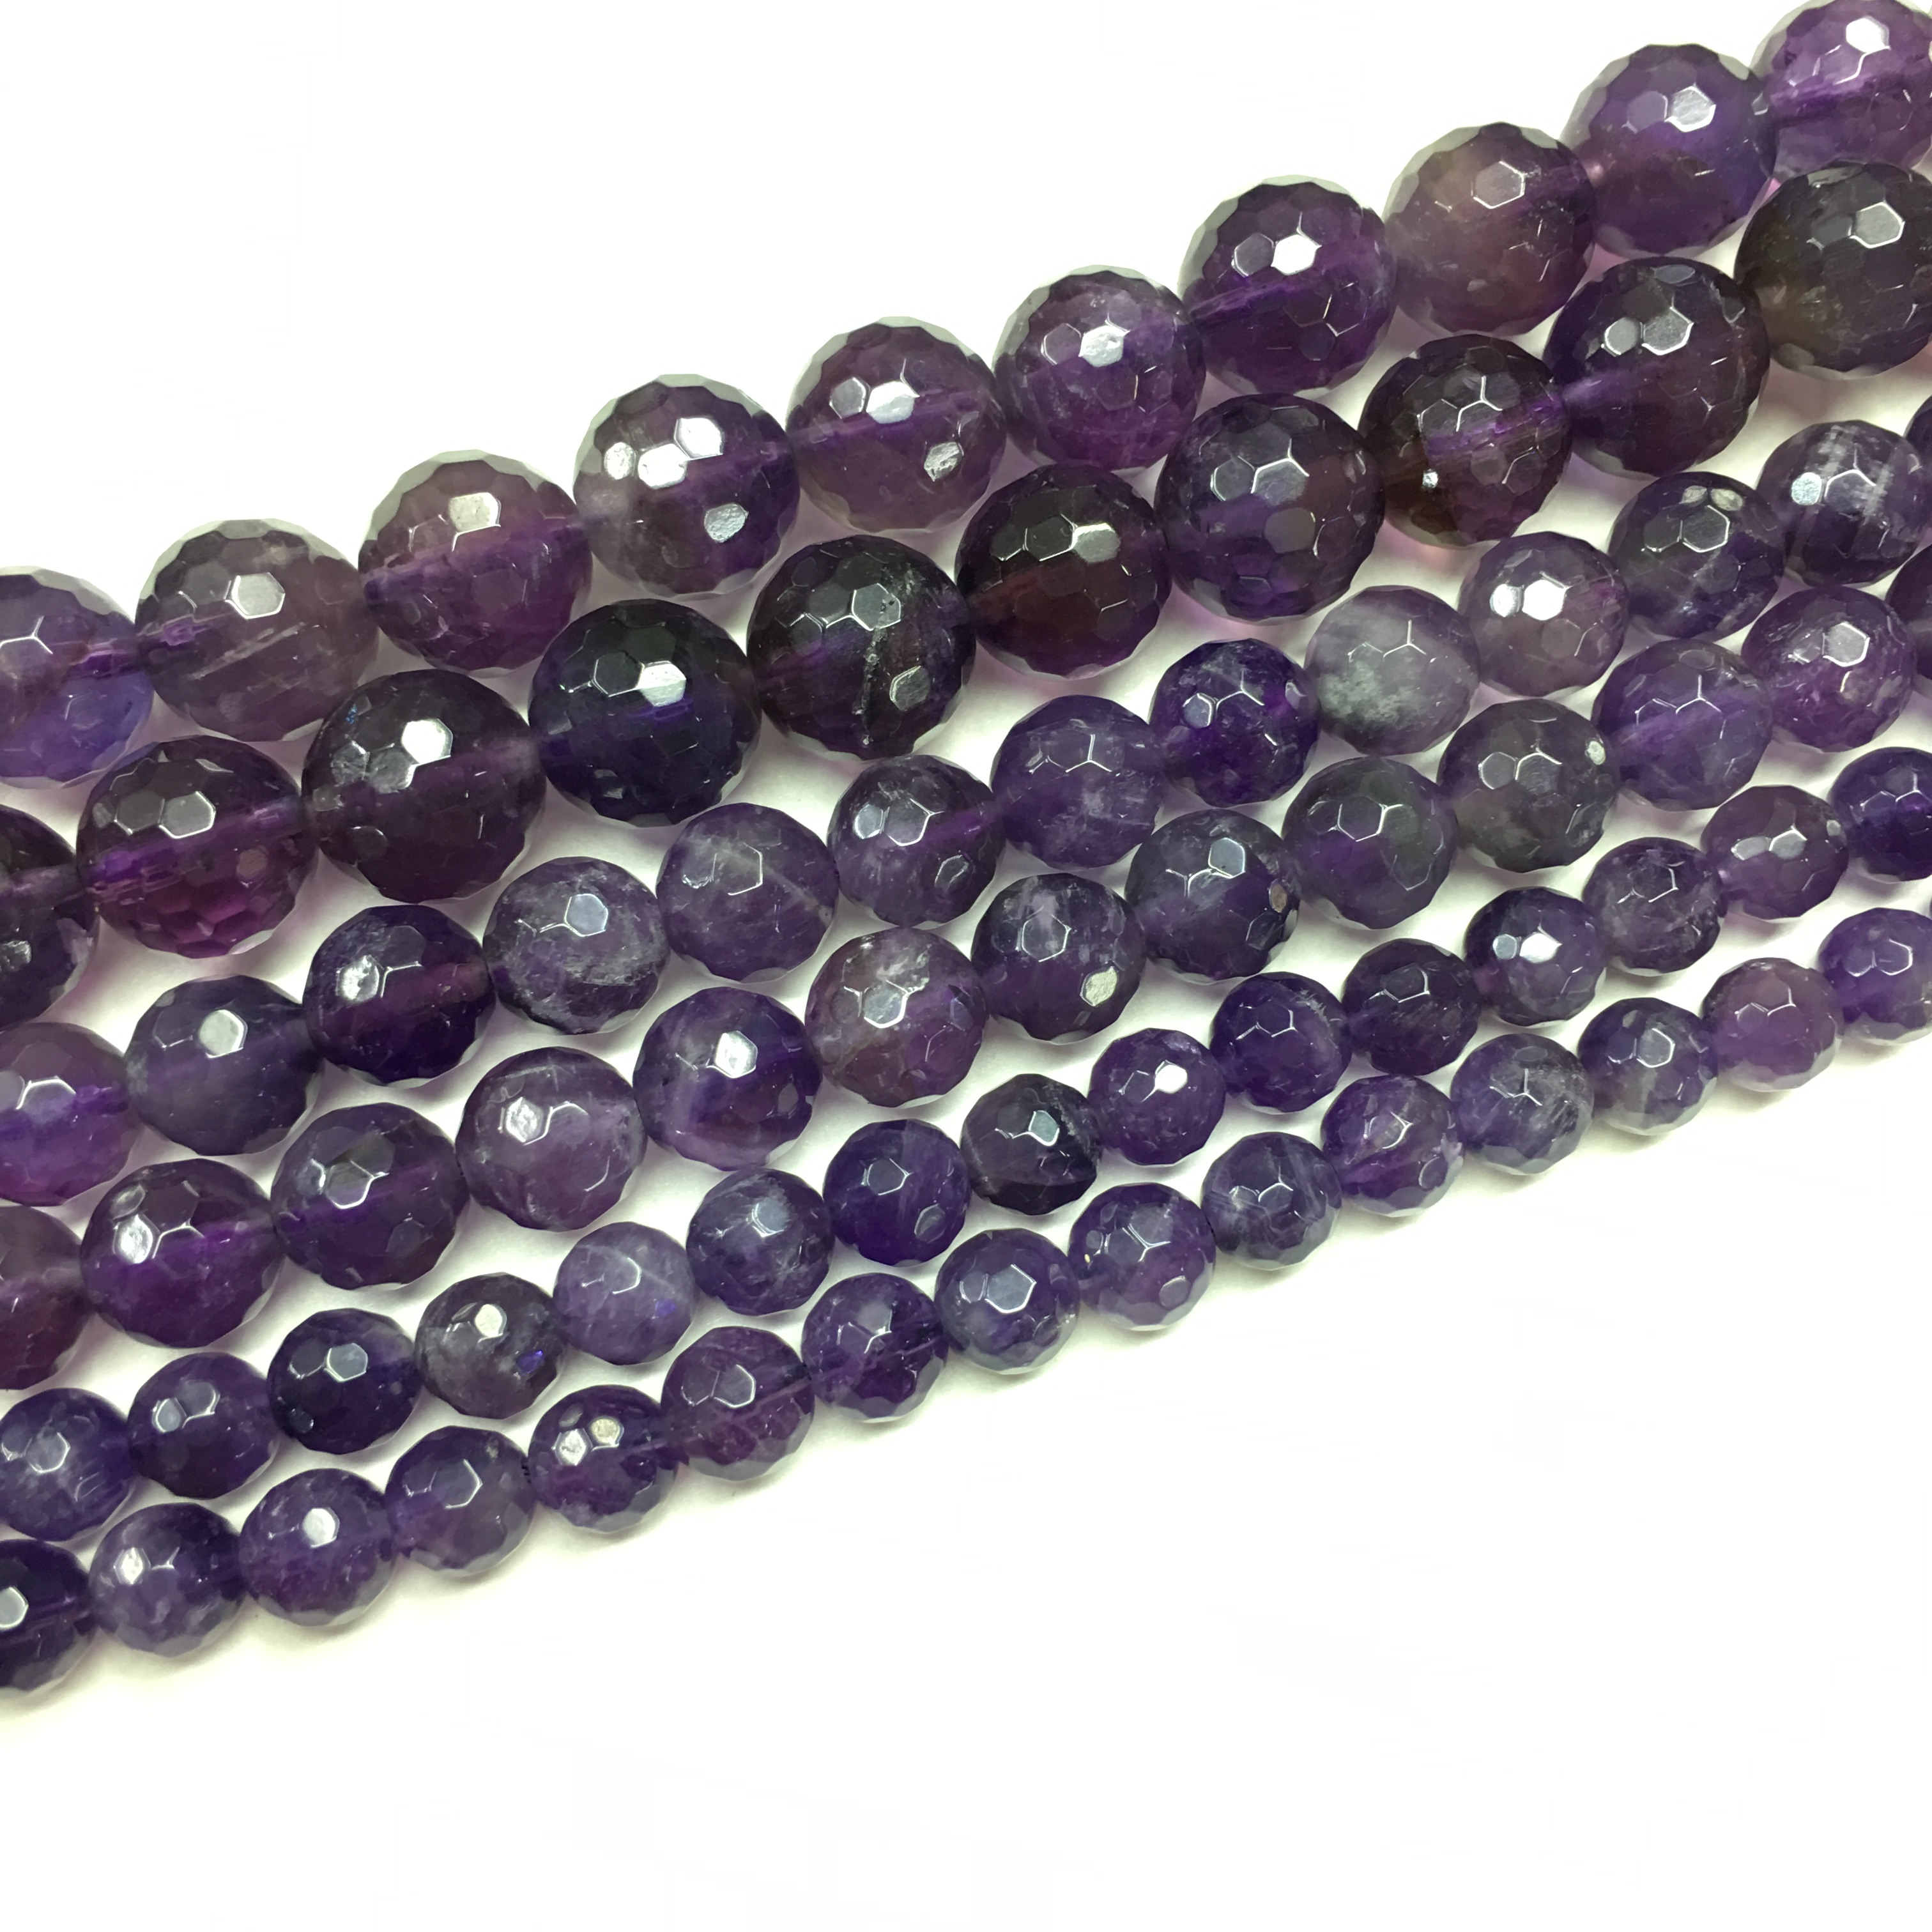 "Amatista Púrpura Facetado Rondelle 4x6mm Natural Piedras Preciosas suelta granos 15/"" AAA"